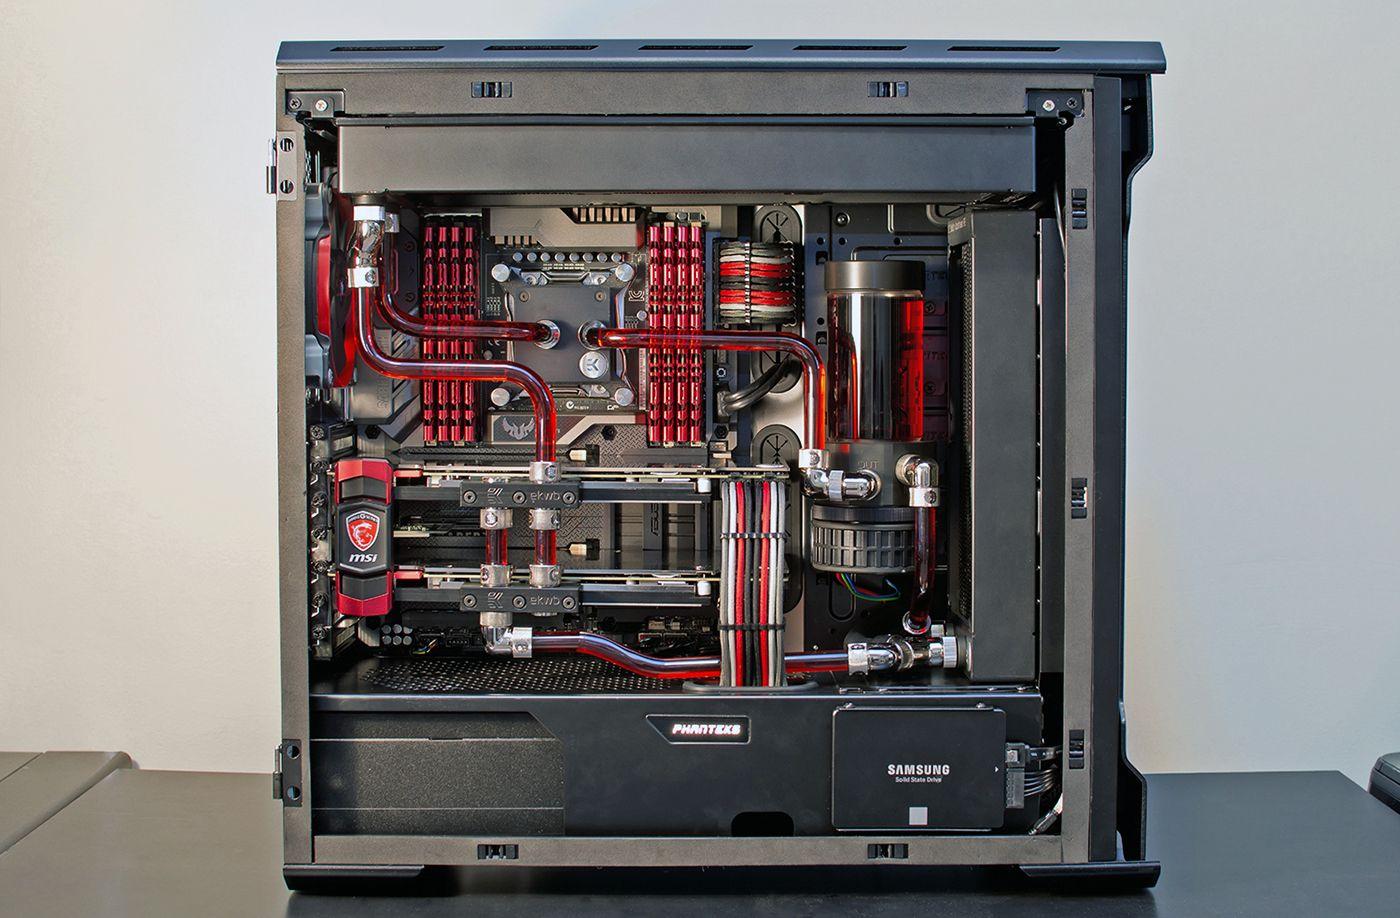 03 Jpg 1400 918 Computer Build Computer Case Deep Red